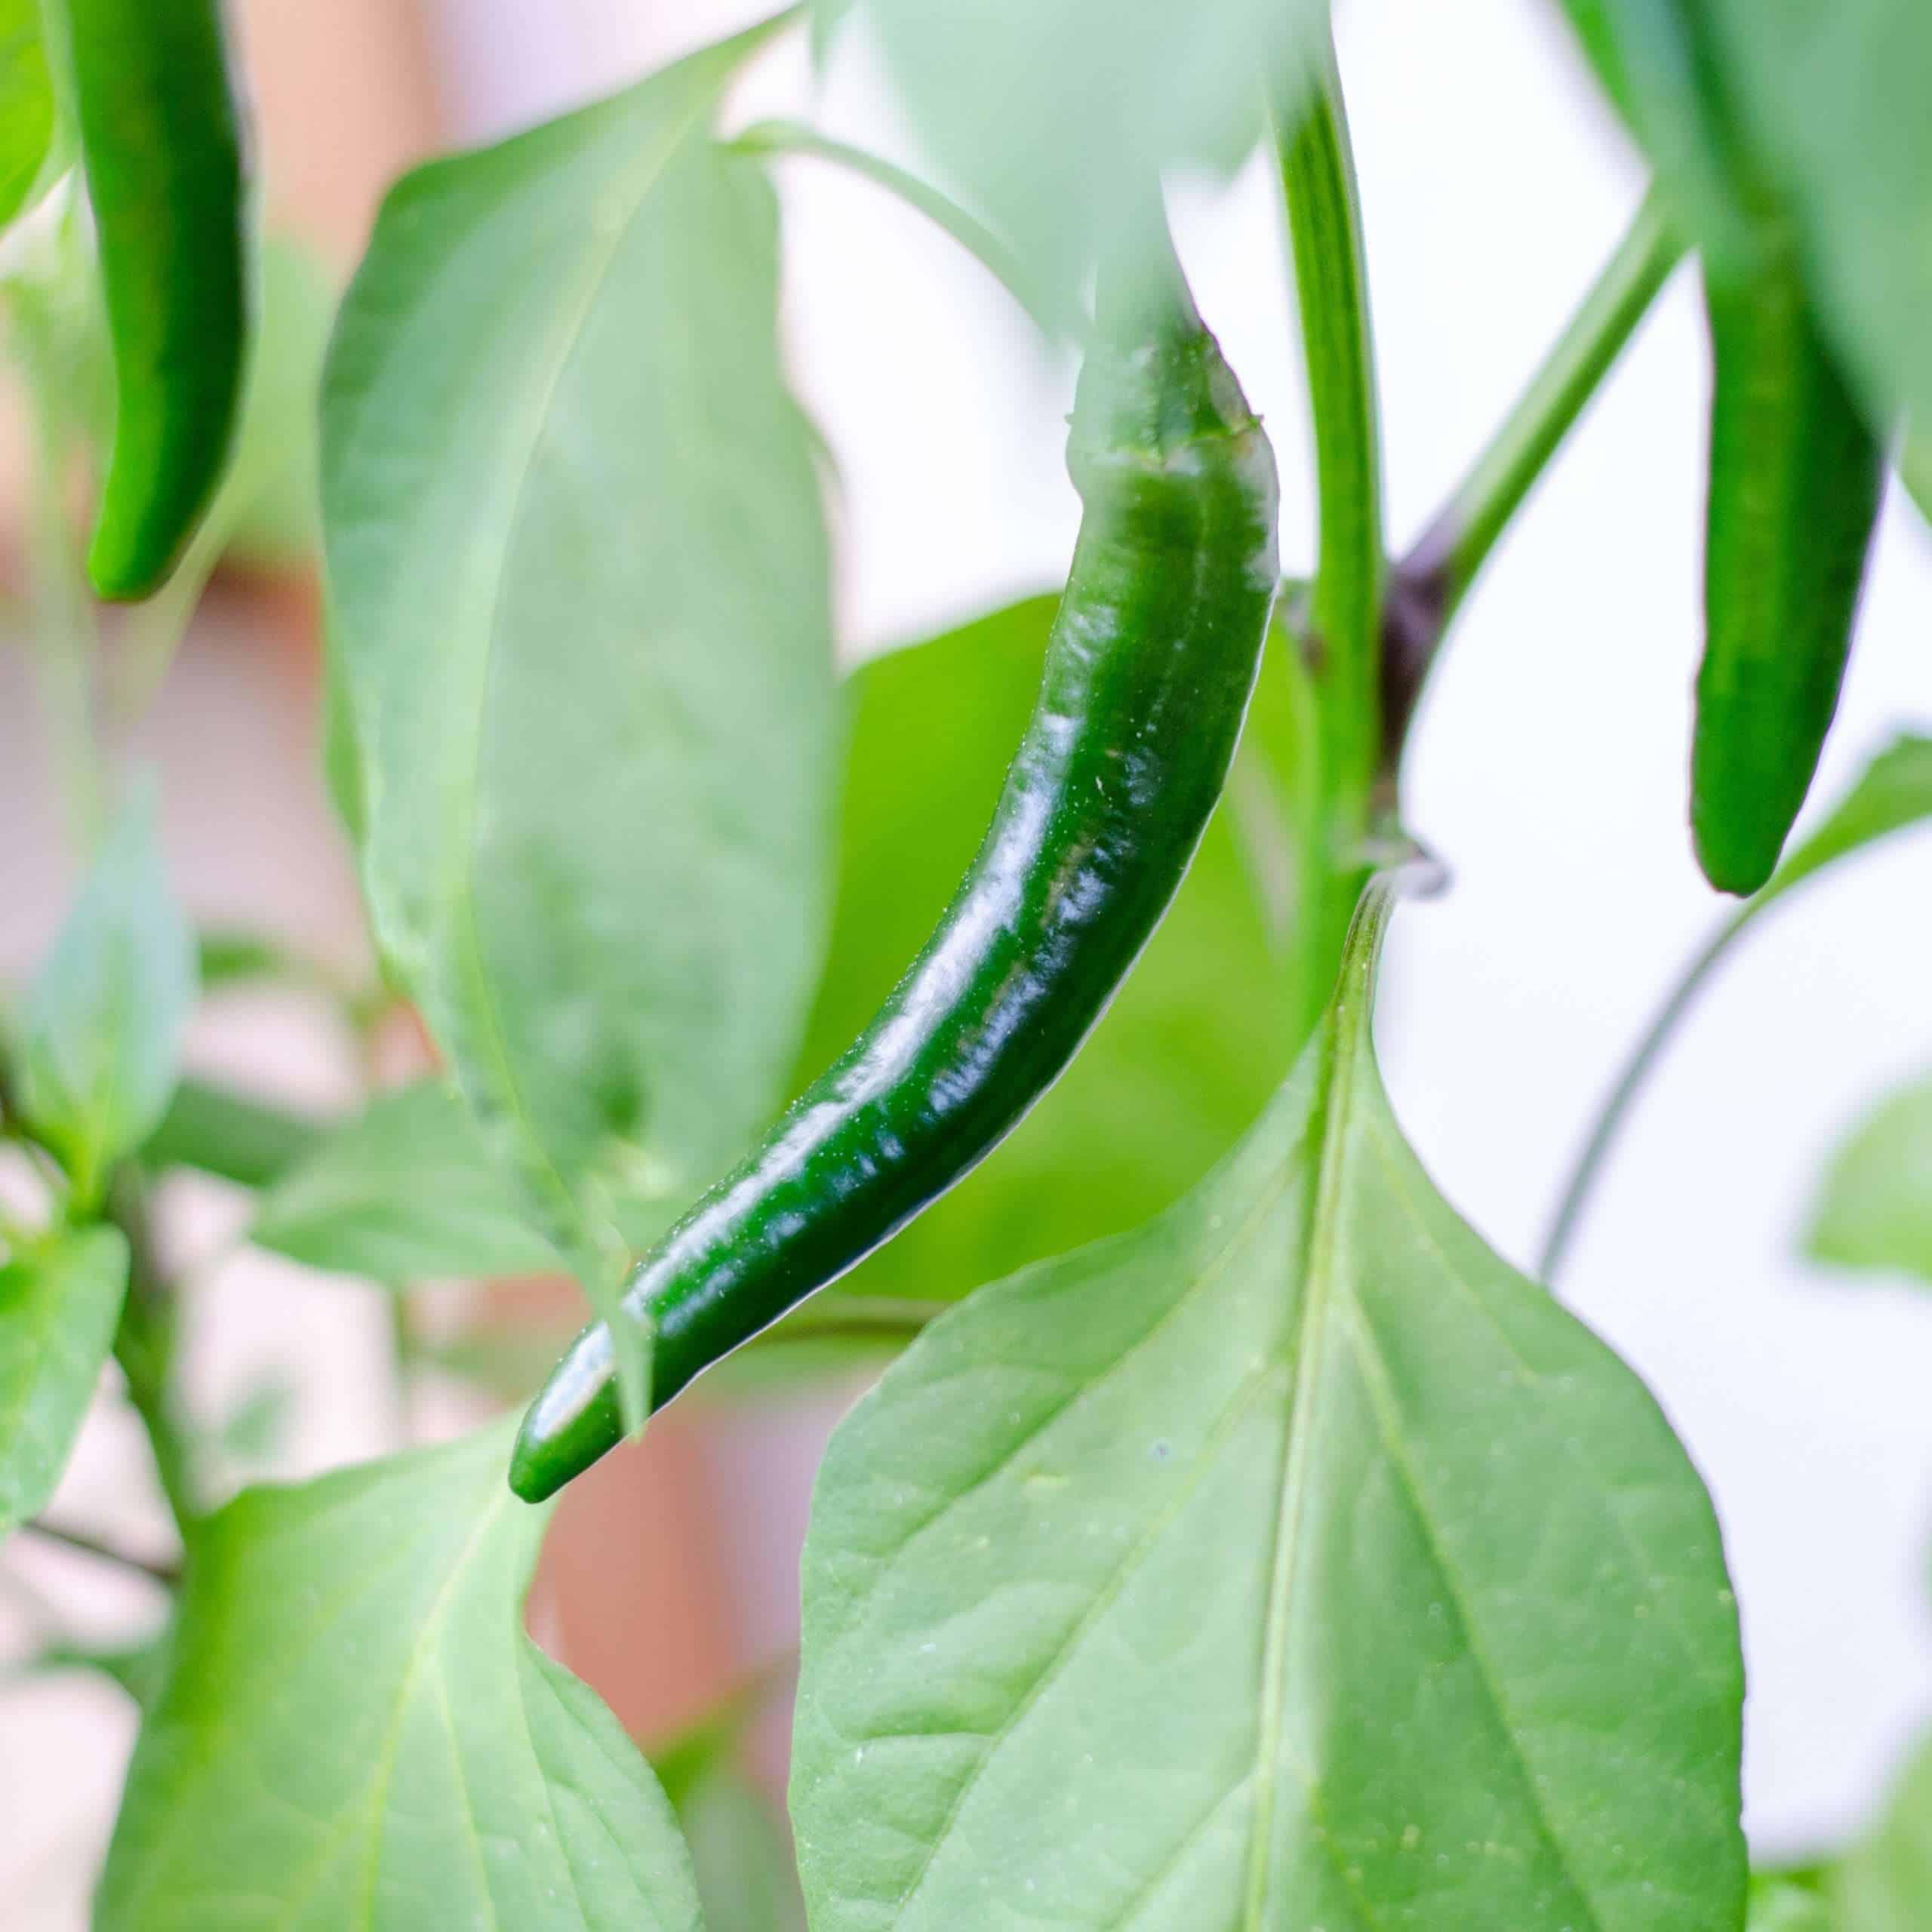 Locally Grown Green Chili on the bush